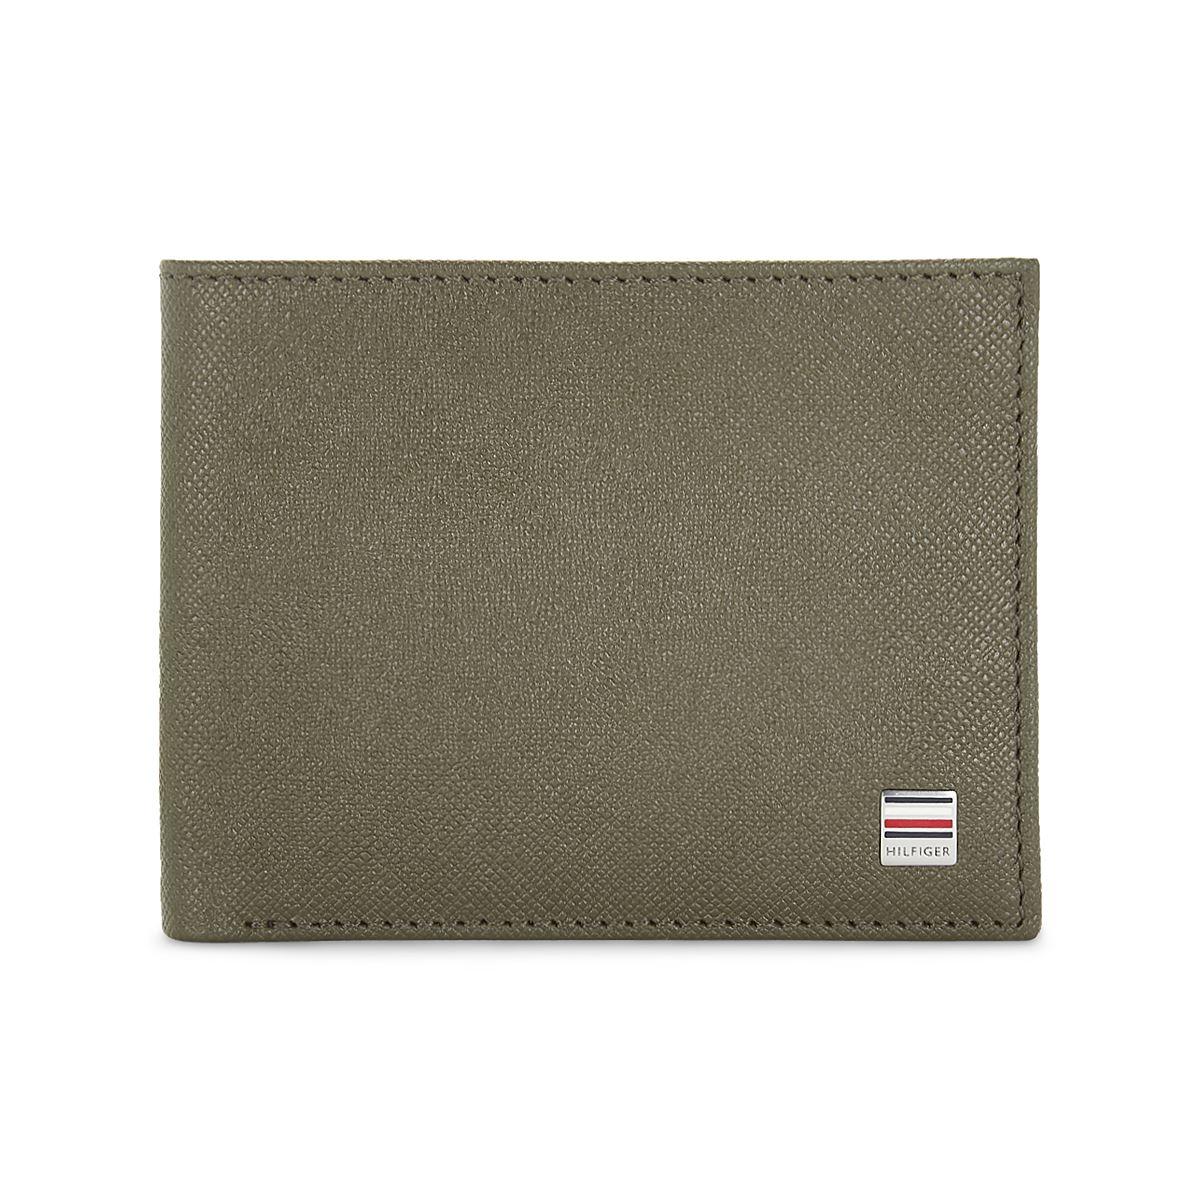 Tommy Hilfiger Leather Mens Textured Olive Orchid Slimfold Wallet